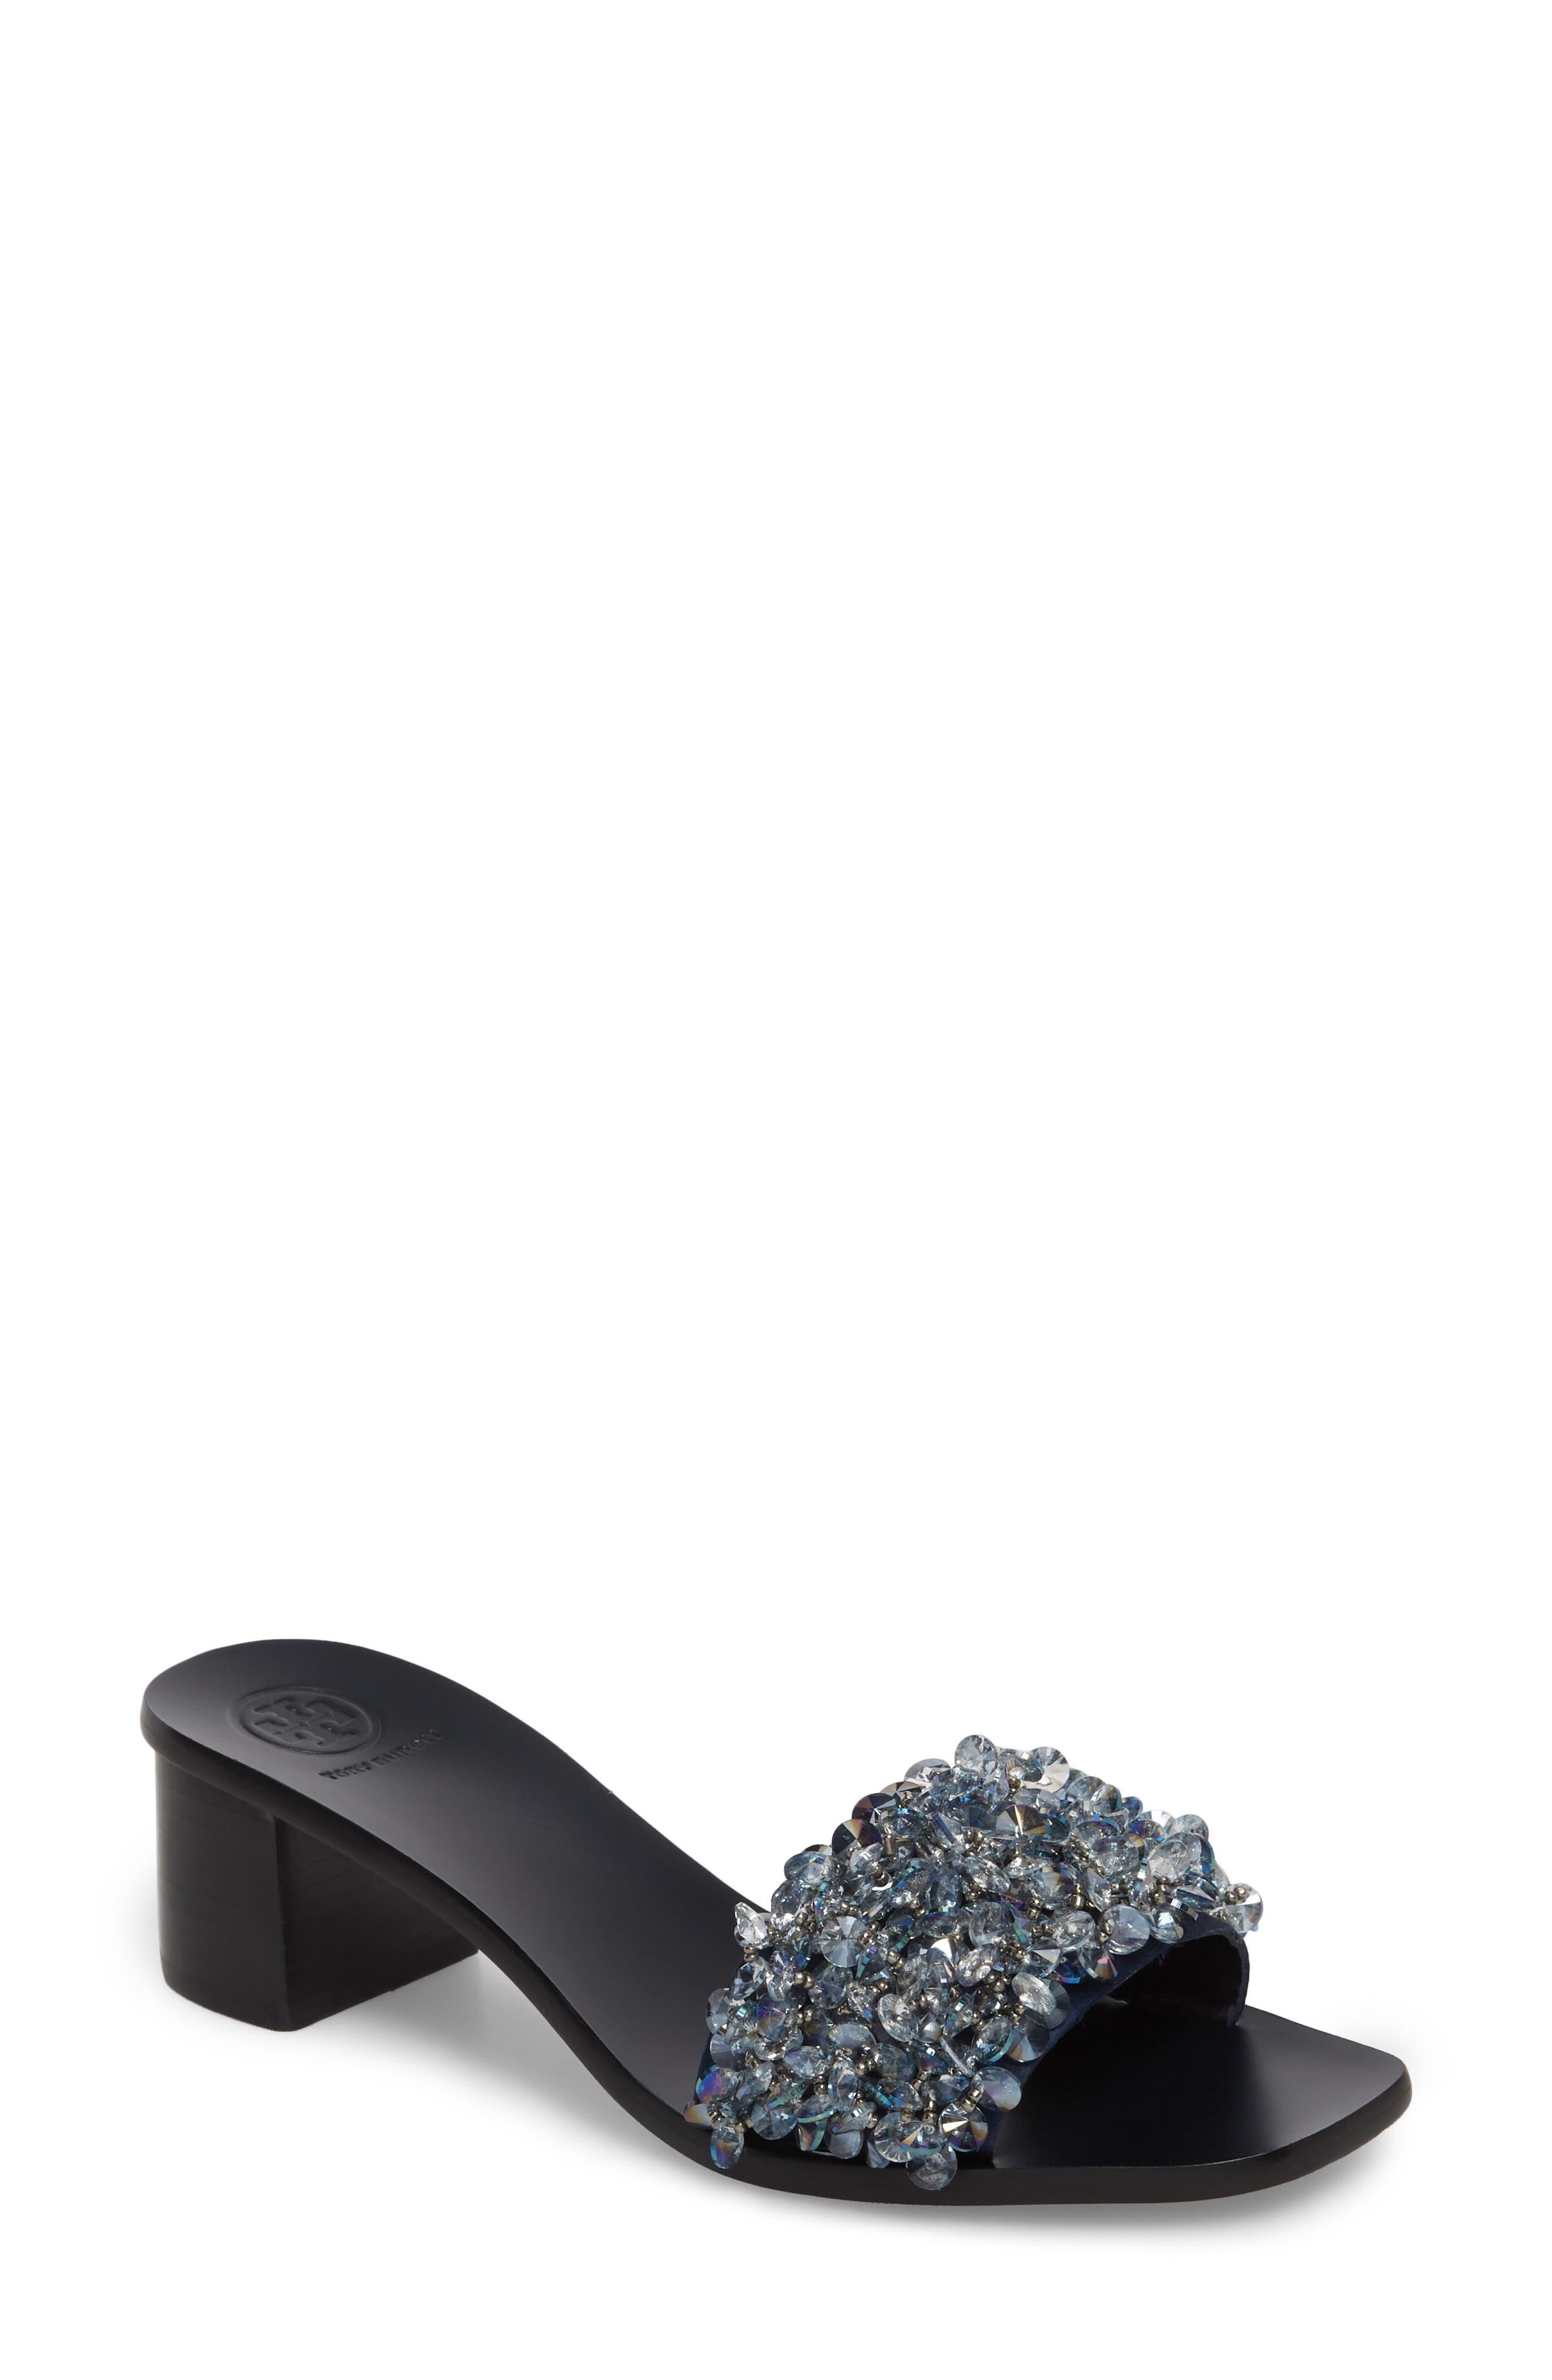 Logan Embellished Slide Sandal,                             Main thumbnail 1, color,                             Gray/ Perfect Navy